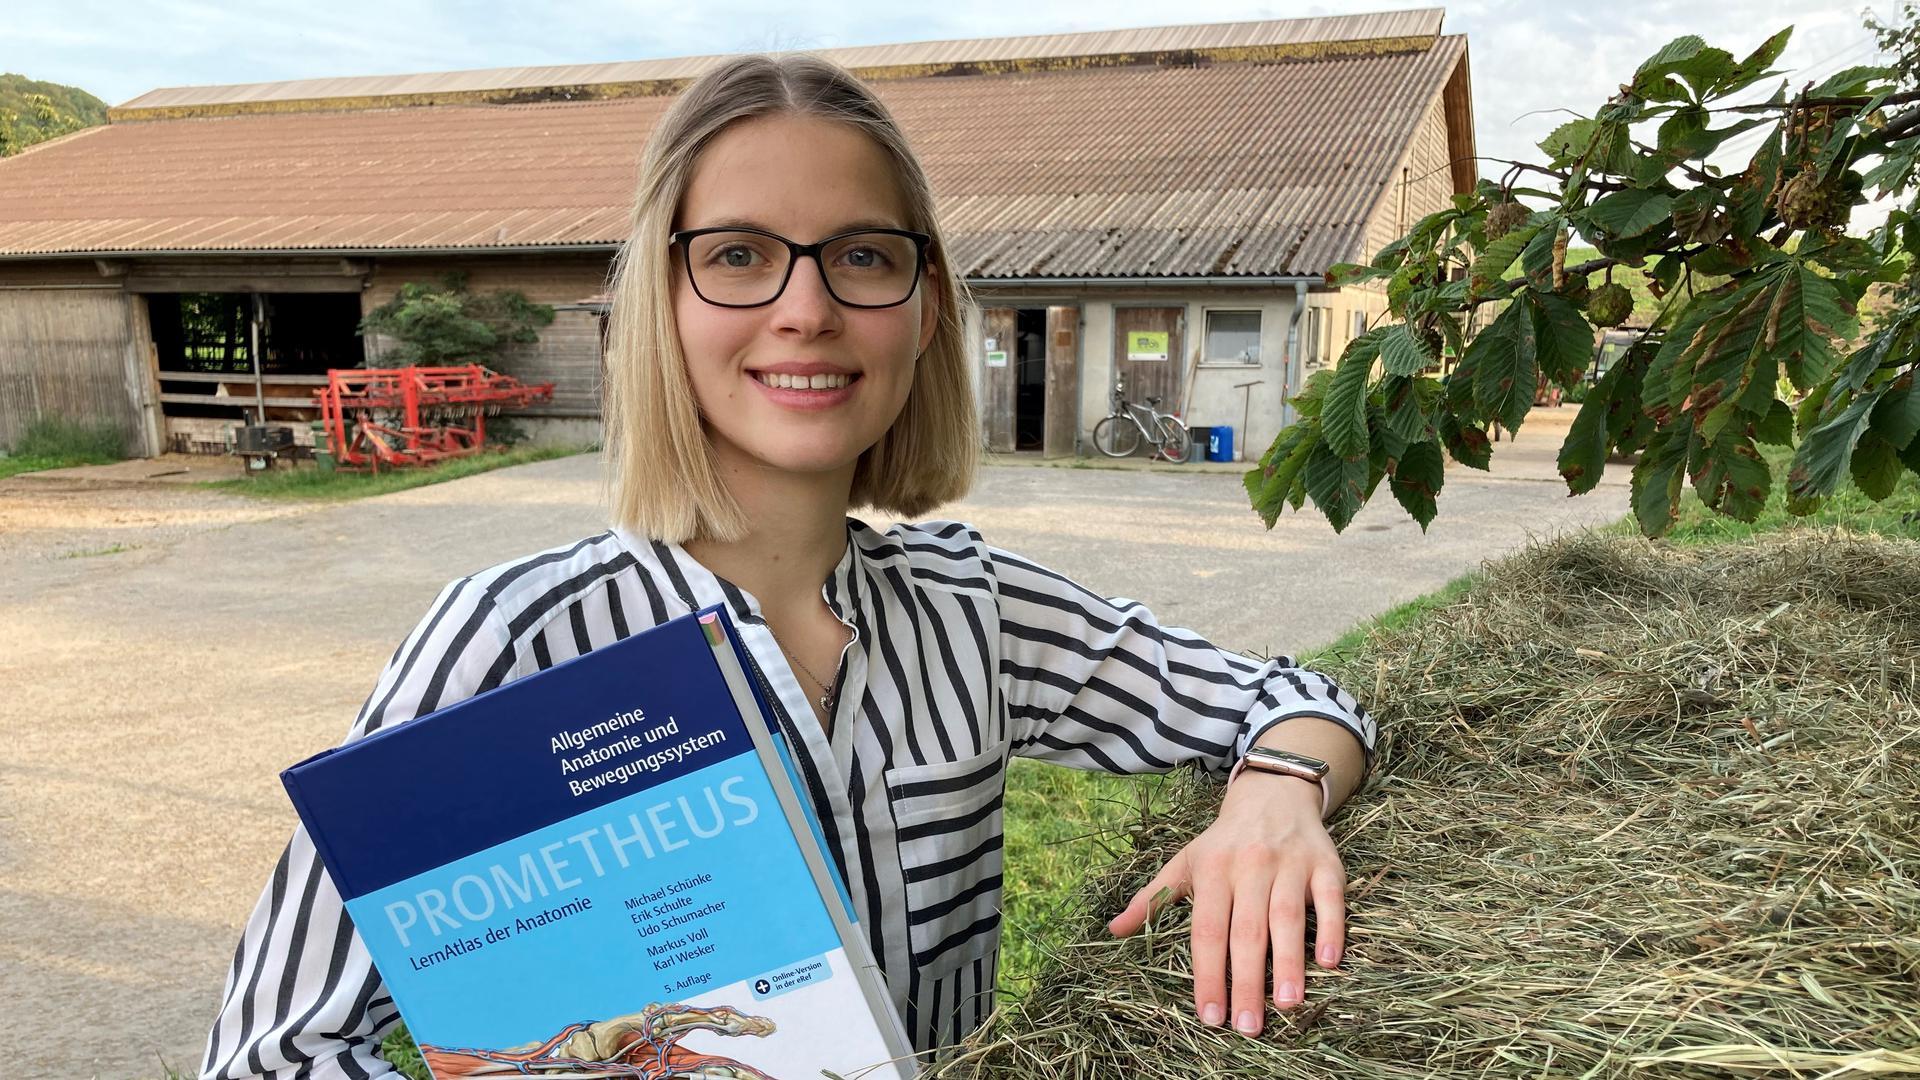 Emily Jilinski, Studentin im Landarzt-Förderprogramm Baden-Württembergs